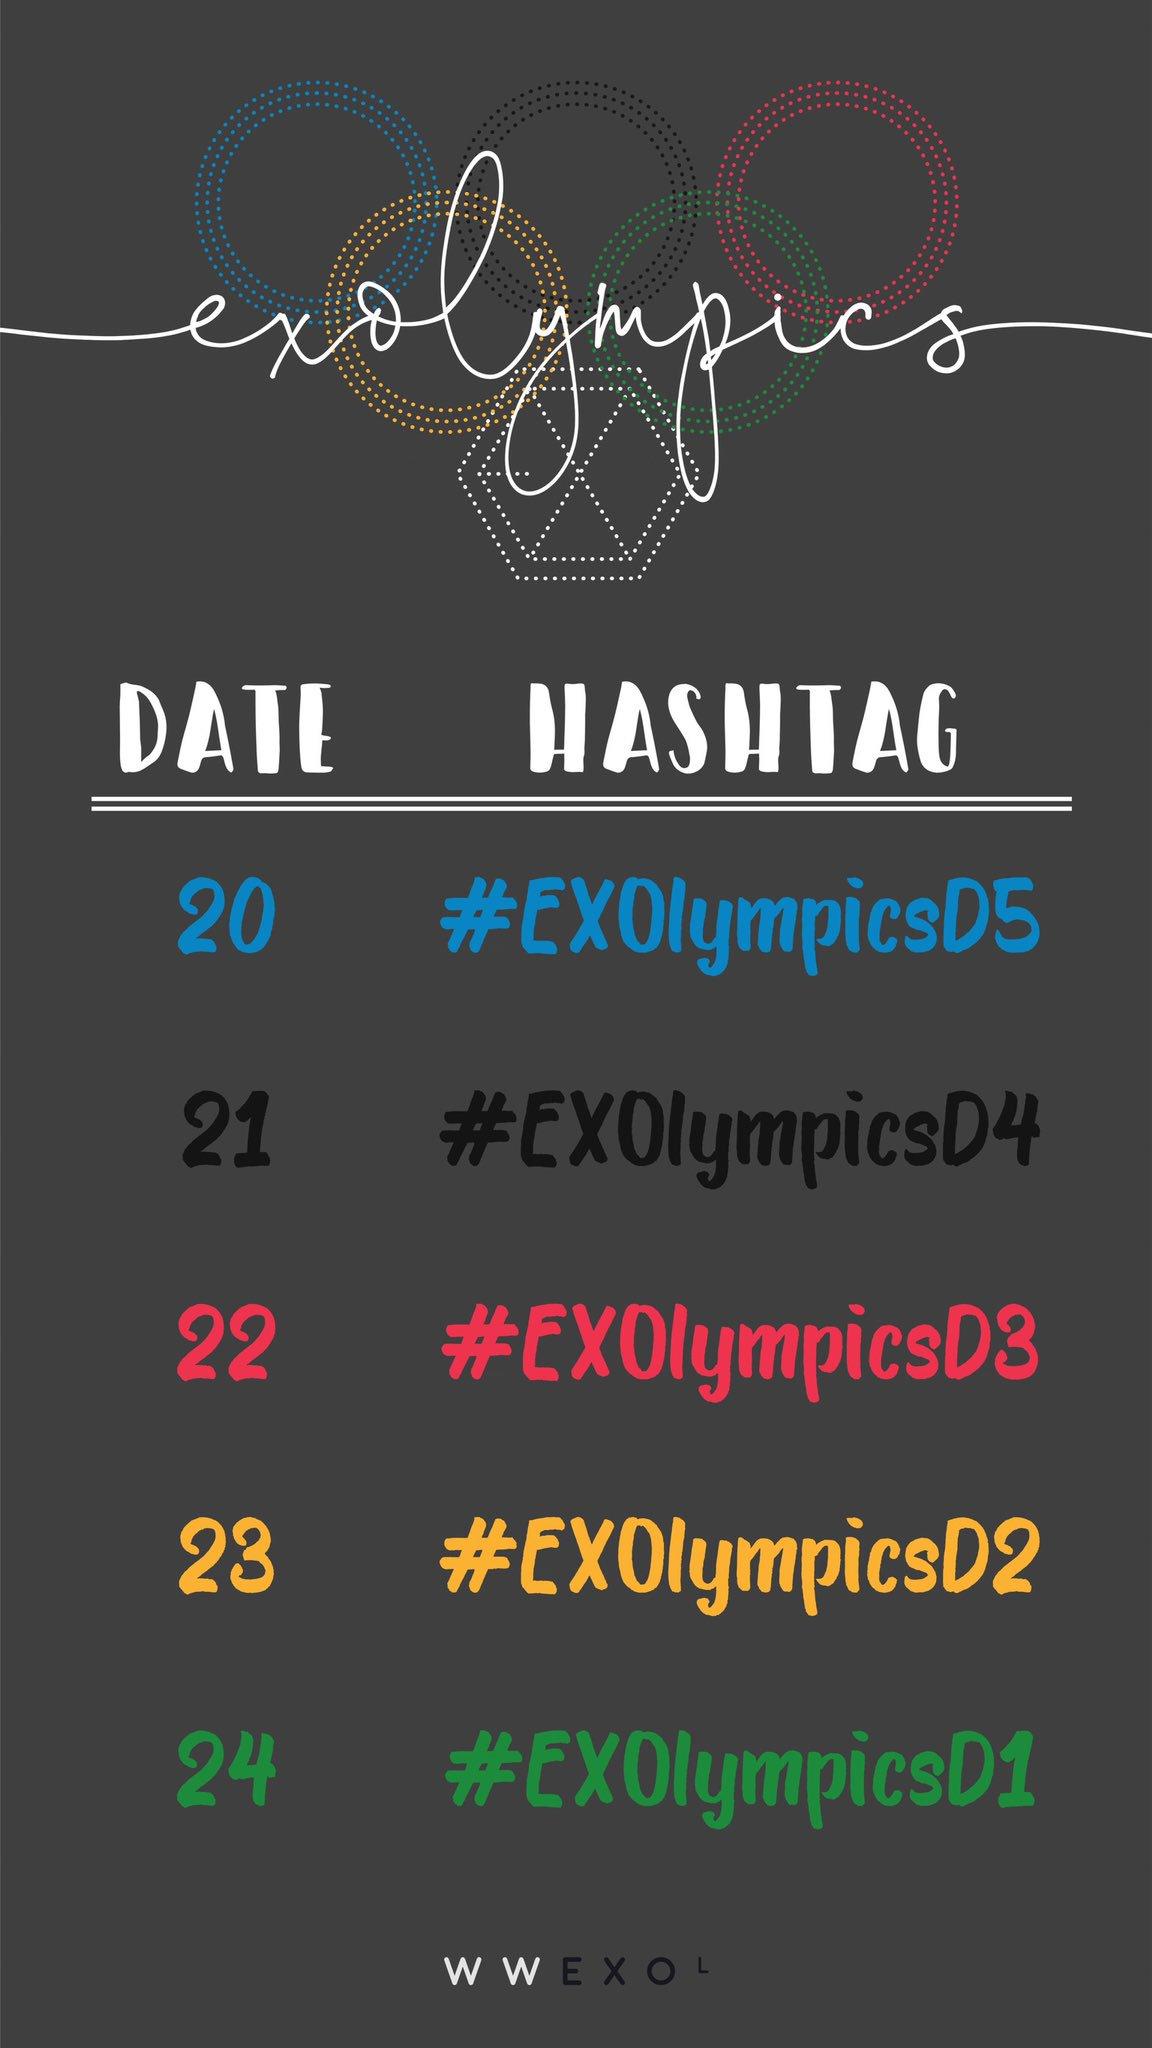 �� EXOLYMPICS COUNTDOWN ��  ��9000 RTS ��  ��4000 REPLIES ��  #EXOL #BestFanArmy #iHeartAwards @weareoneEXO #EXOlympicsD2 https://t.co/b9XvAfWyRU